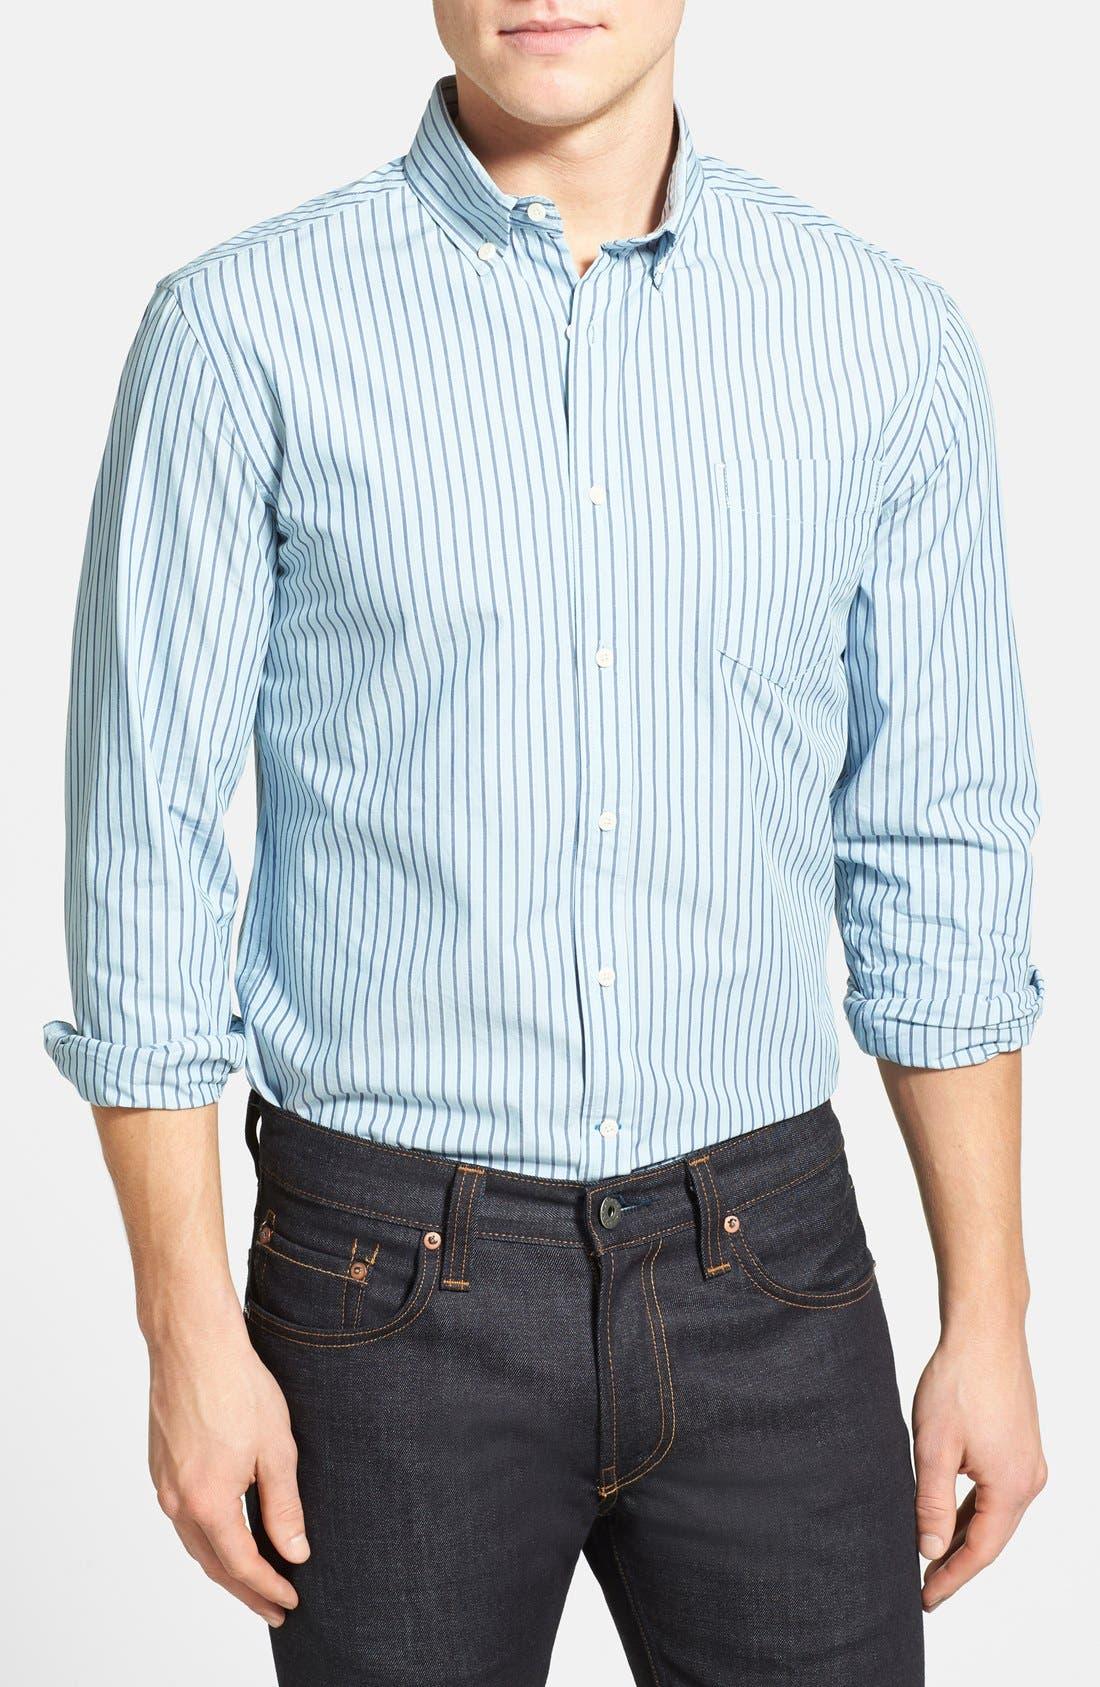 Main Image - Haspel Slim Fit Oxford Stripe Button Down Sport Shirt